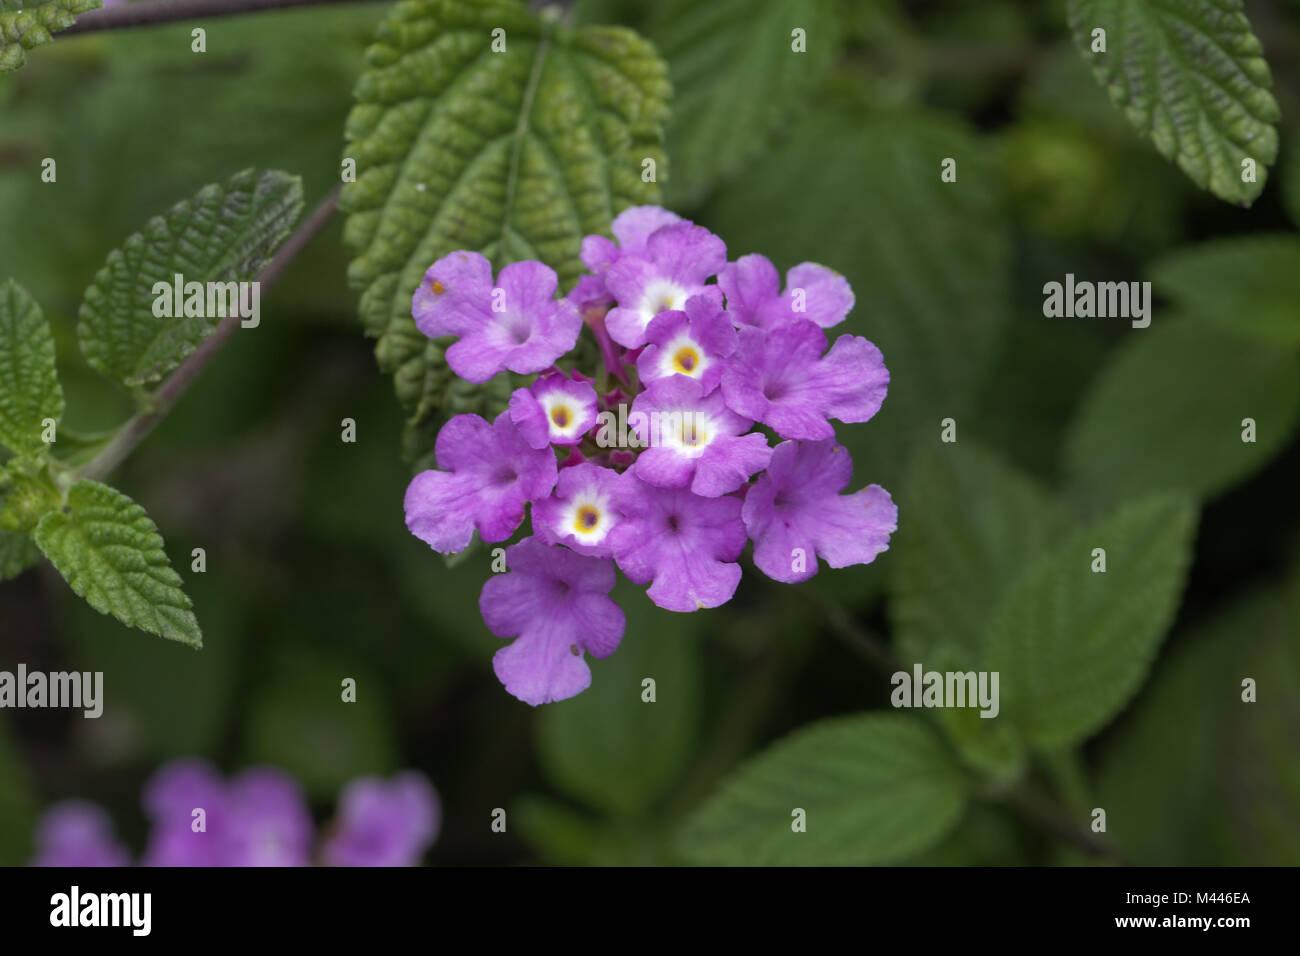 Lantana Montevidensis Trailing Or Creeping Lantana Garden Stock